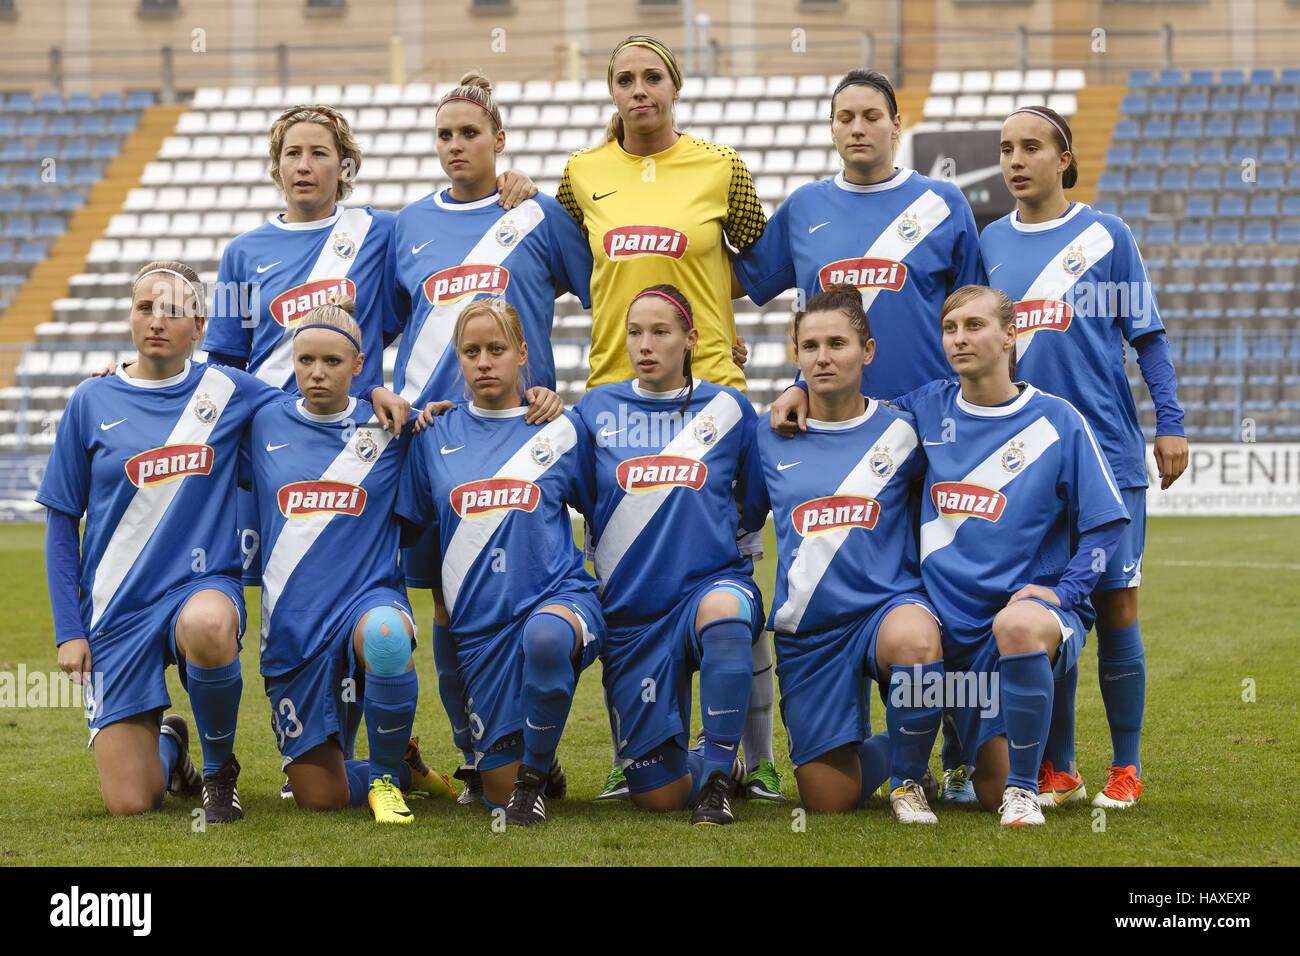 MTK vs. Potsdam football match - Stock Image